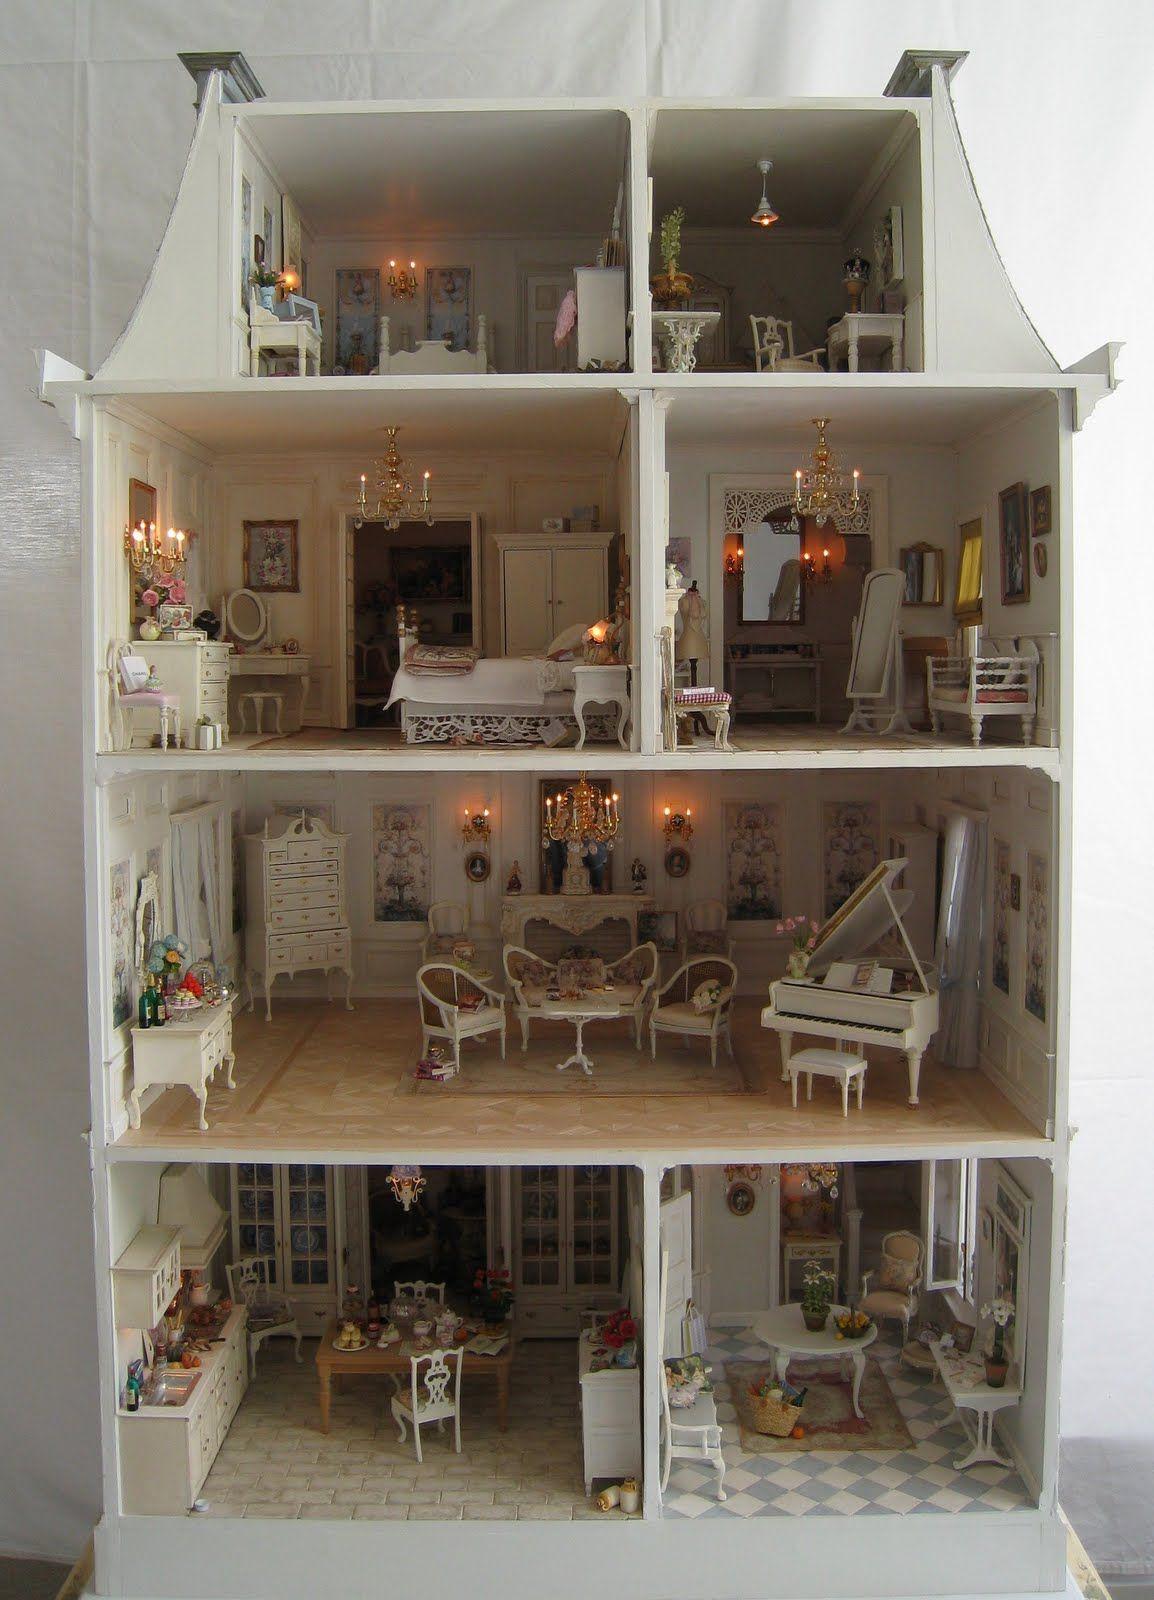 ZsaZsa Bellagio: Search results for dollhouse | DOLLHOUSE ... - photo#50